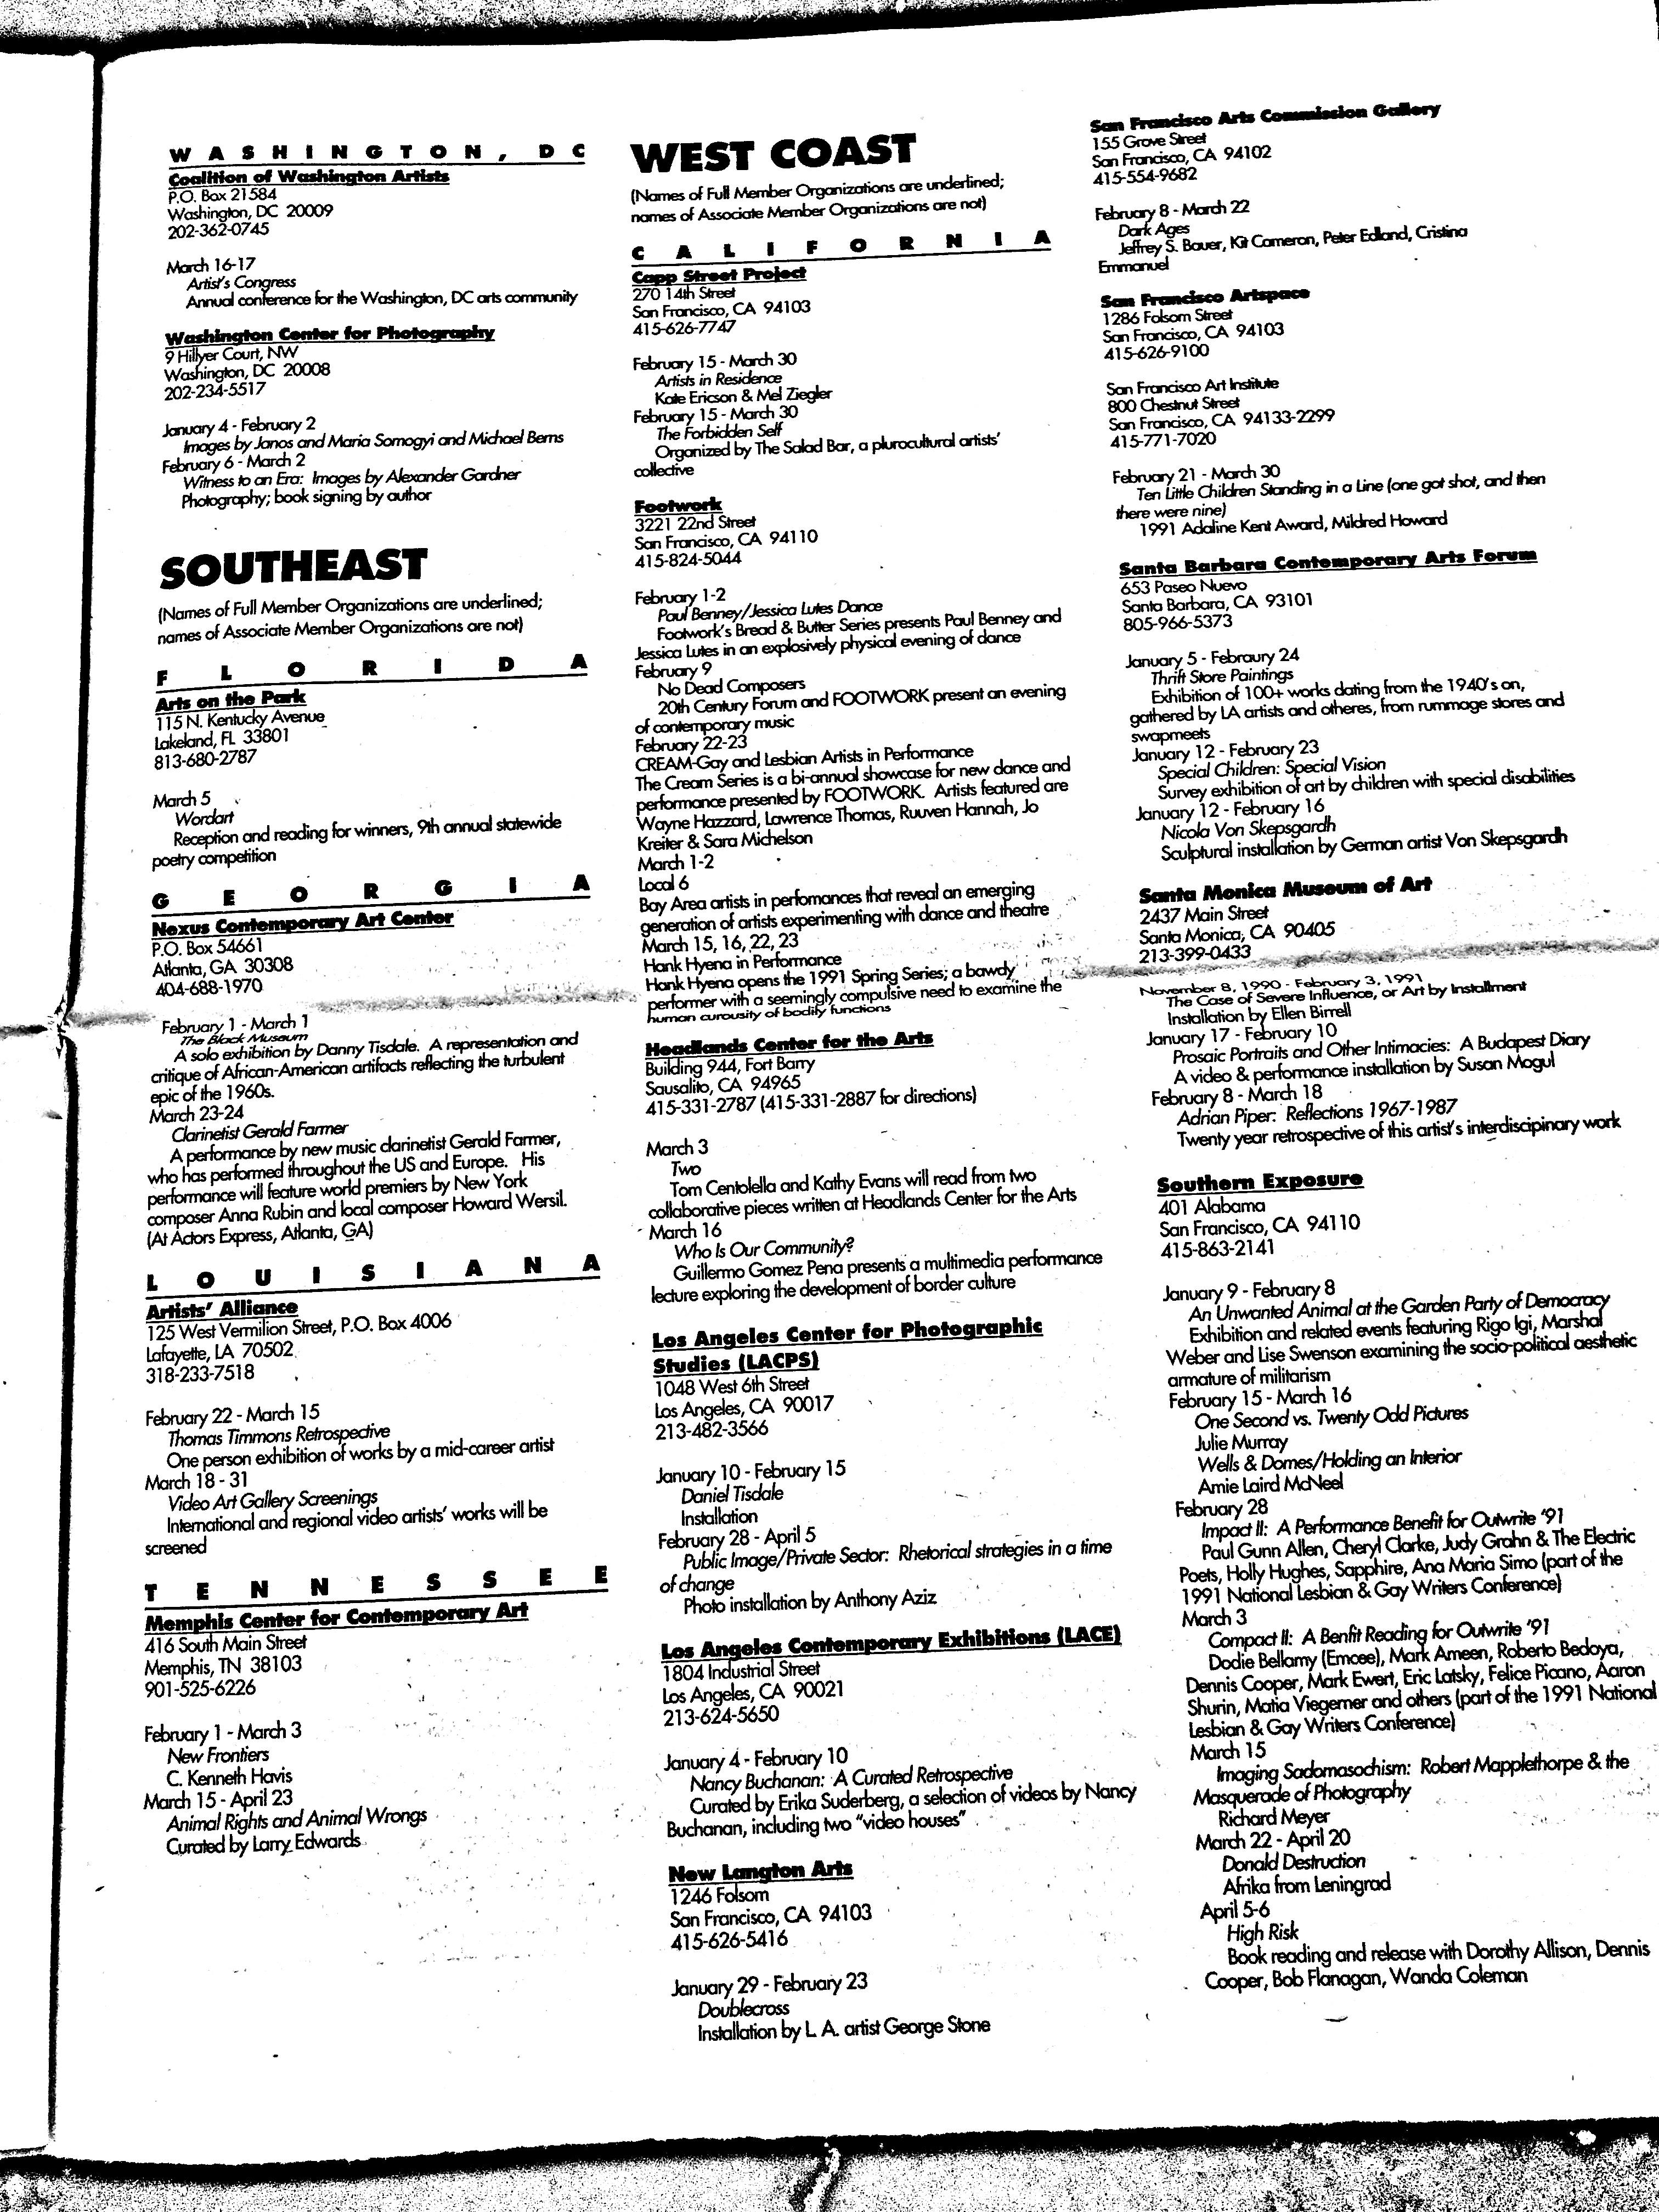 January 1991 - NAAO Bulletin Page 17.jpg